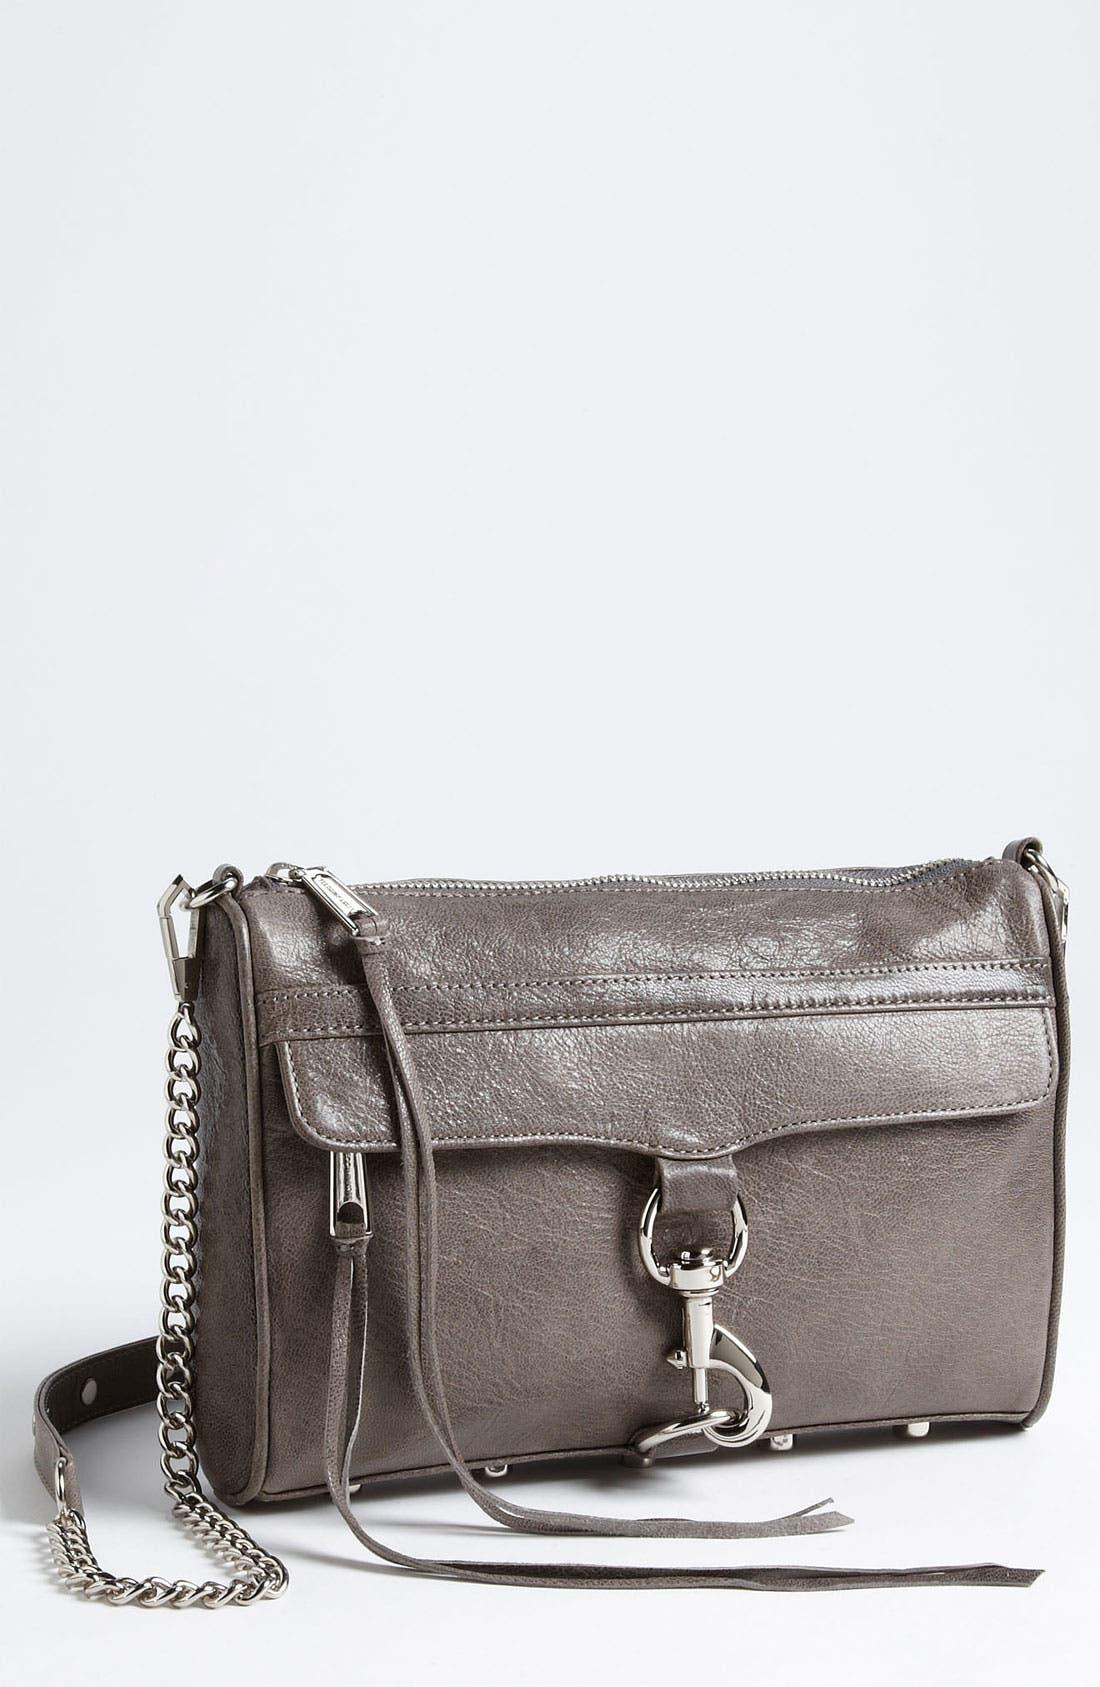 Main Image - Rebecca Minkoff 'MAC' Leather Shoulder Bag